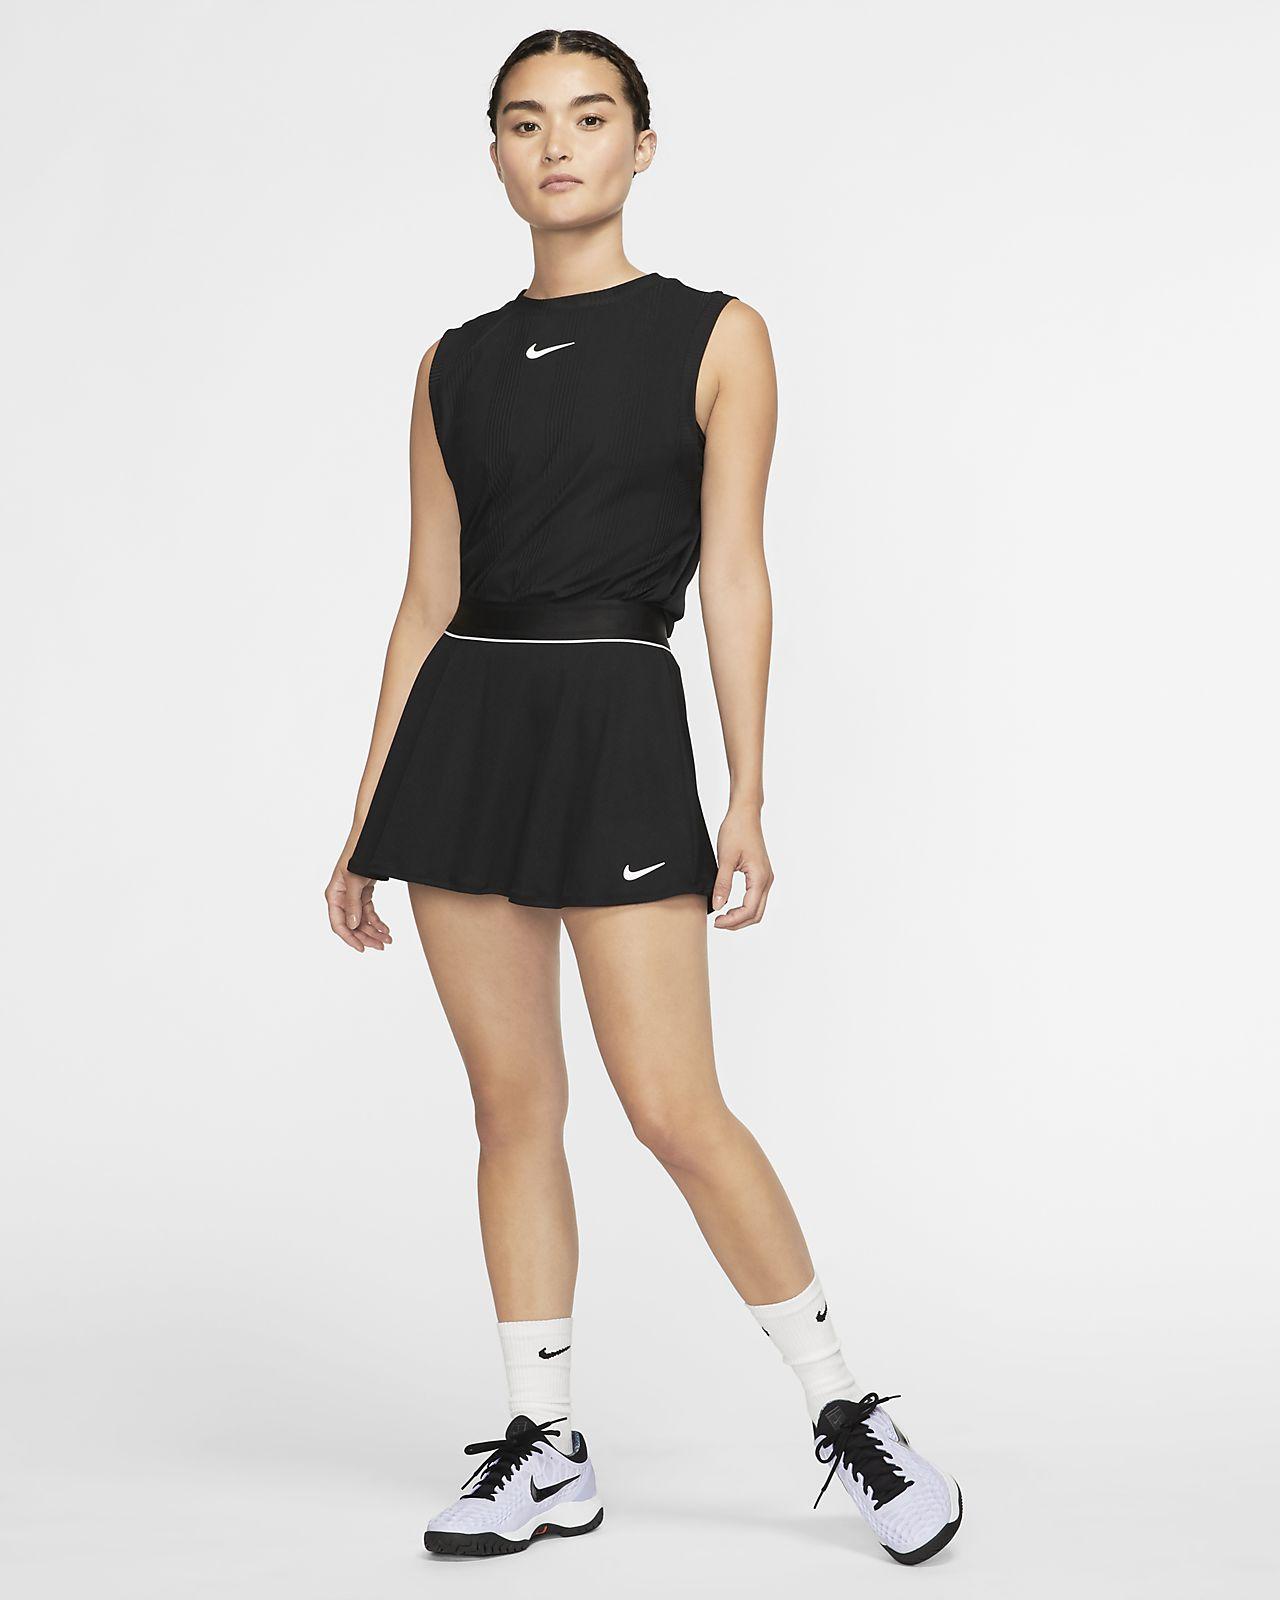 Nike Womens Tennis Outfits Off 53 Www Ncccc Gov Eg